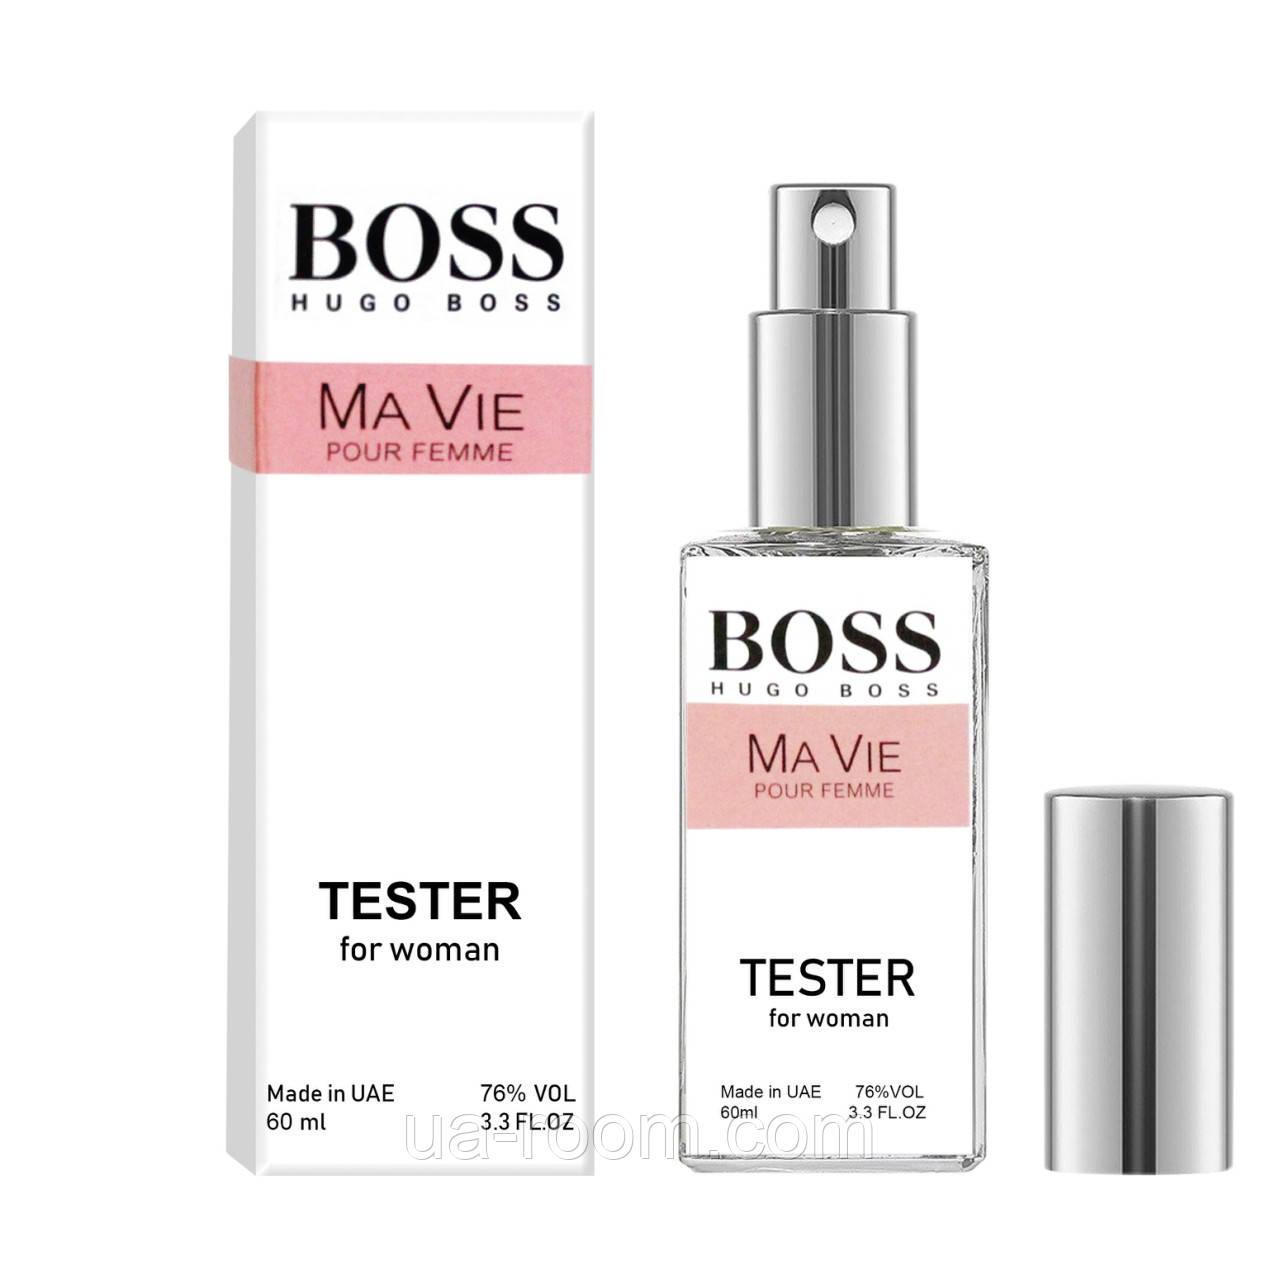 Тестер DUTYFREE  женский Hugo Boss Boss Ma Vie Pour Femme, 60 мл.